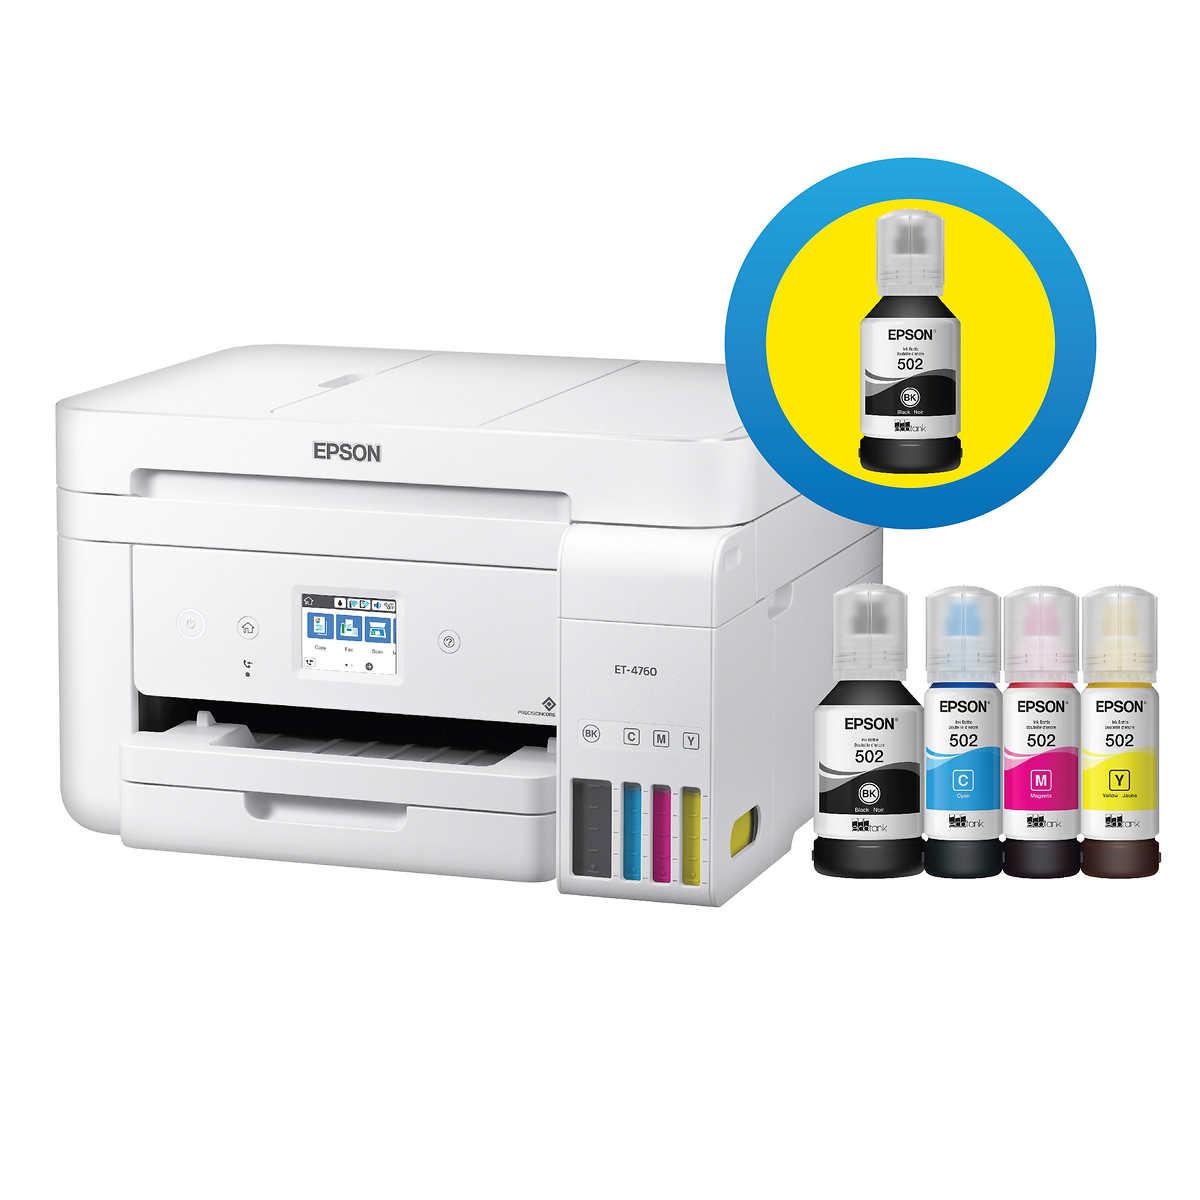 Epson Ecotank Et 4760 Special Edition All In One Wireless Supertank Printer With Bonus Black Ink